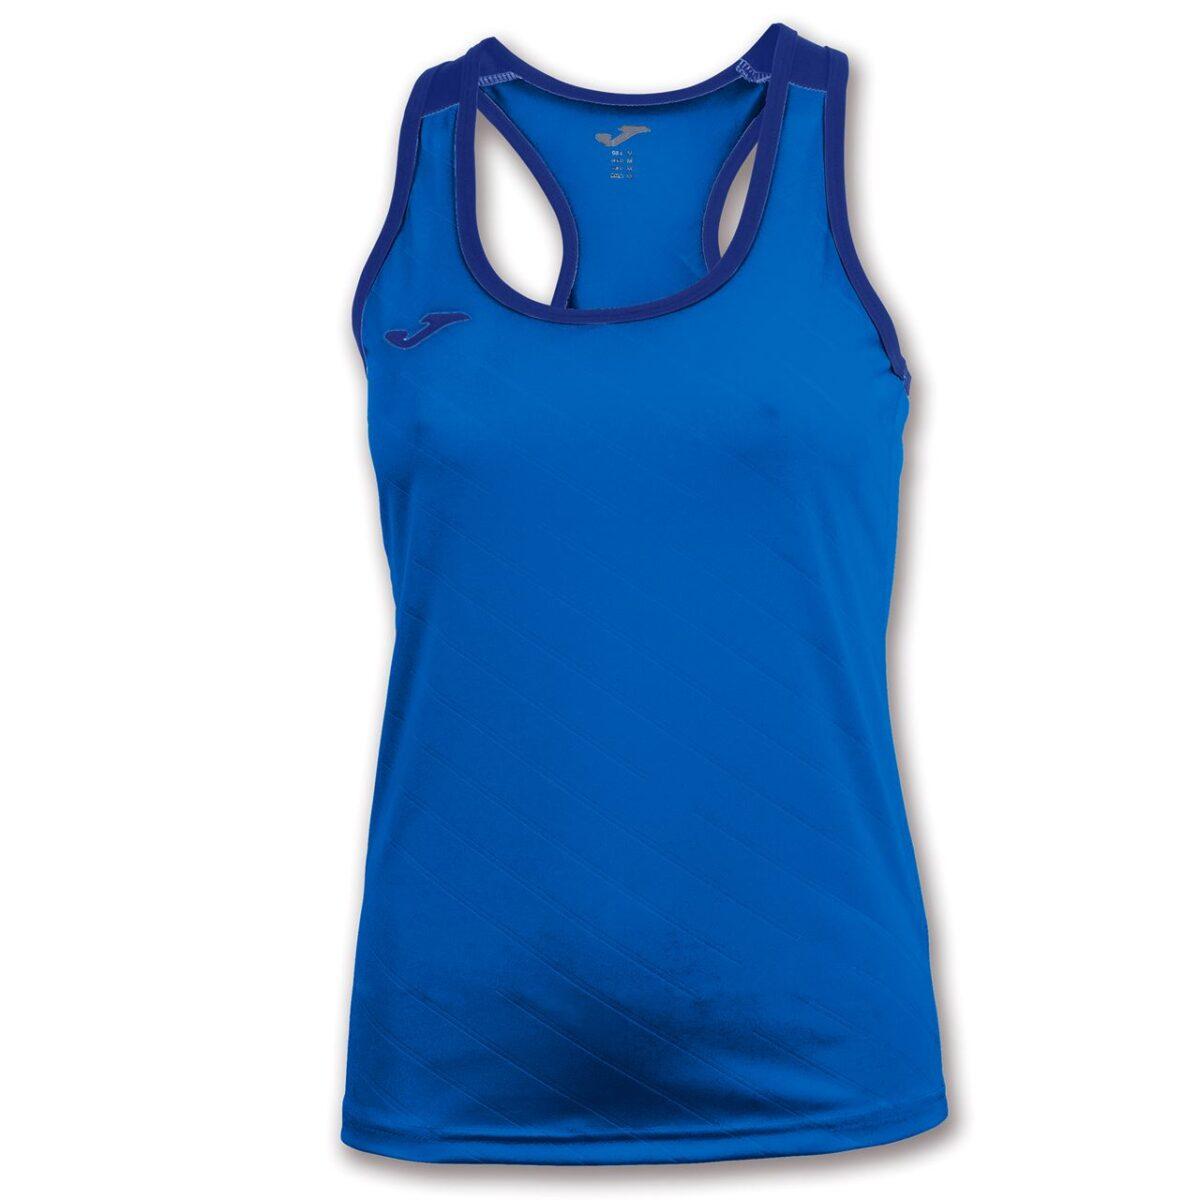 Joma Torneo II T-Shirt Sleeveless Woman Adult 900743